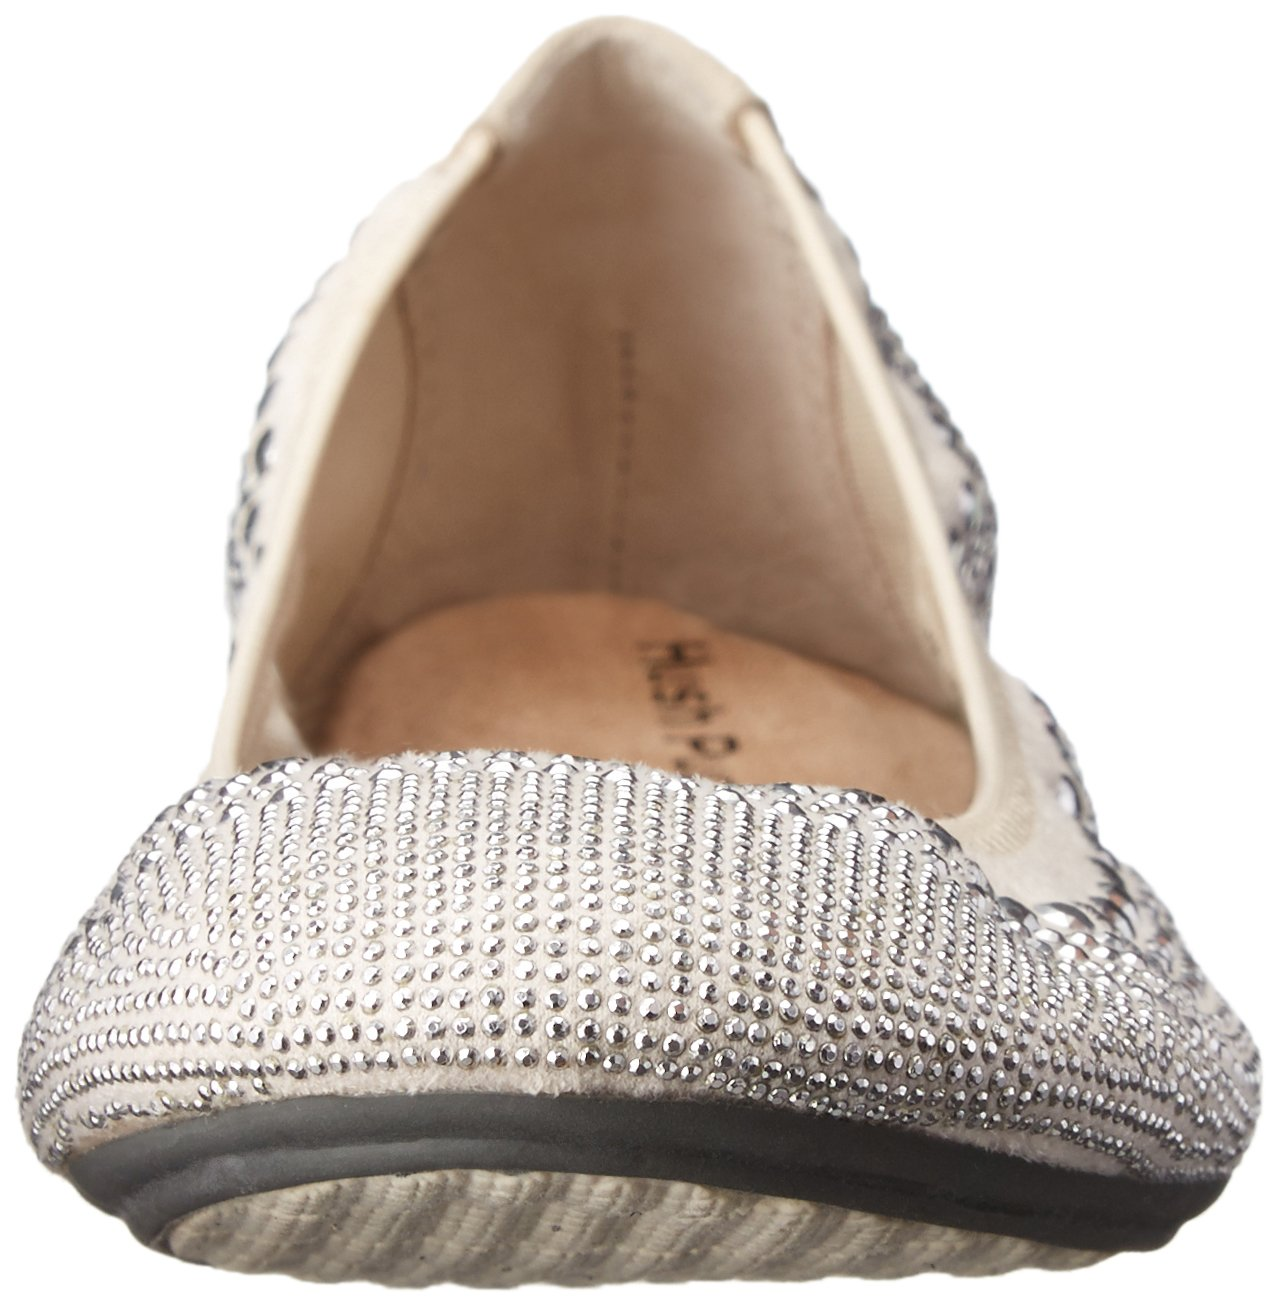 Hush Puppies Women's Chaste Ballet Flat B005B4YBZA 9 XW US|Silver Stud